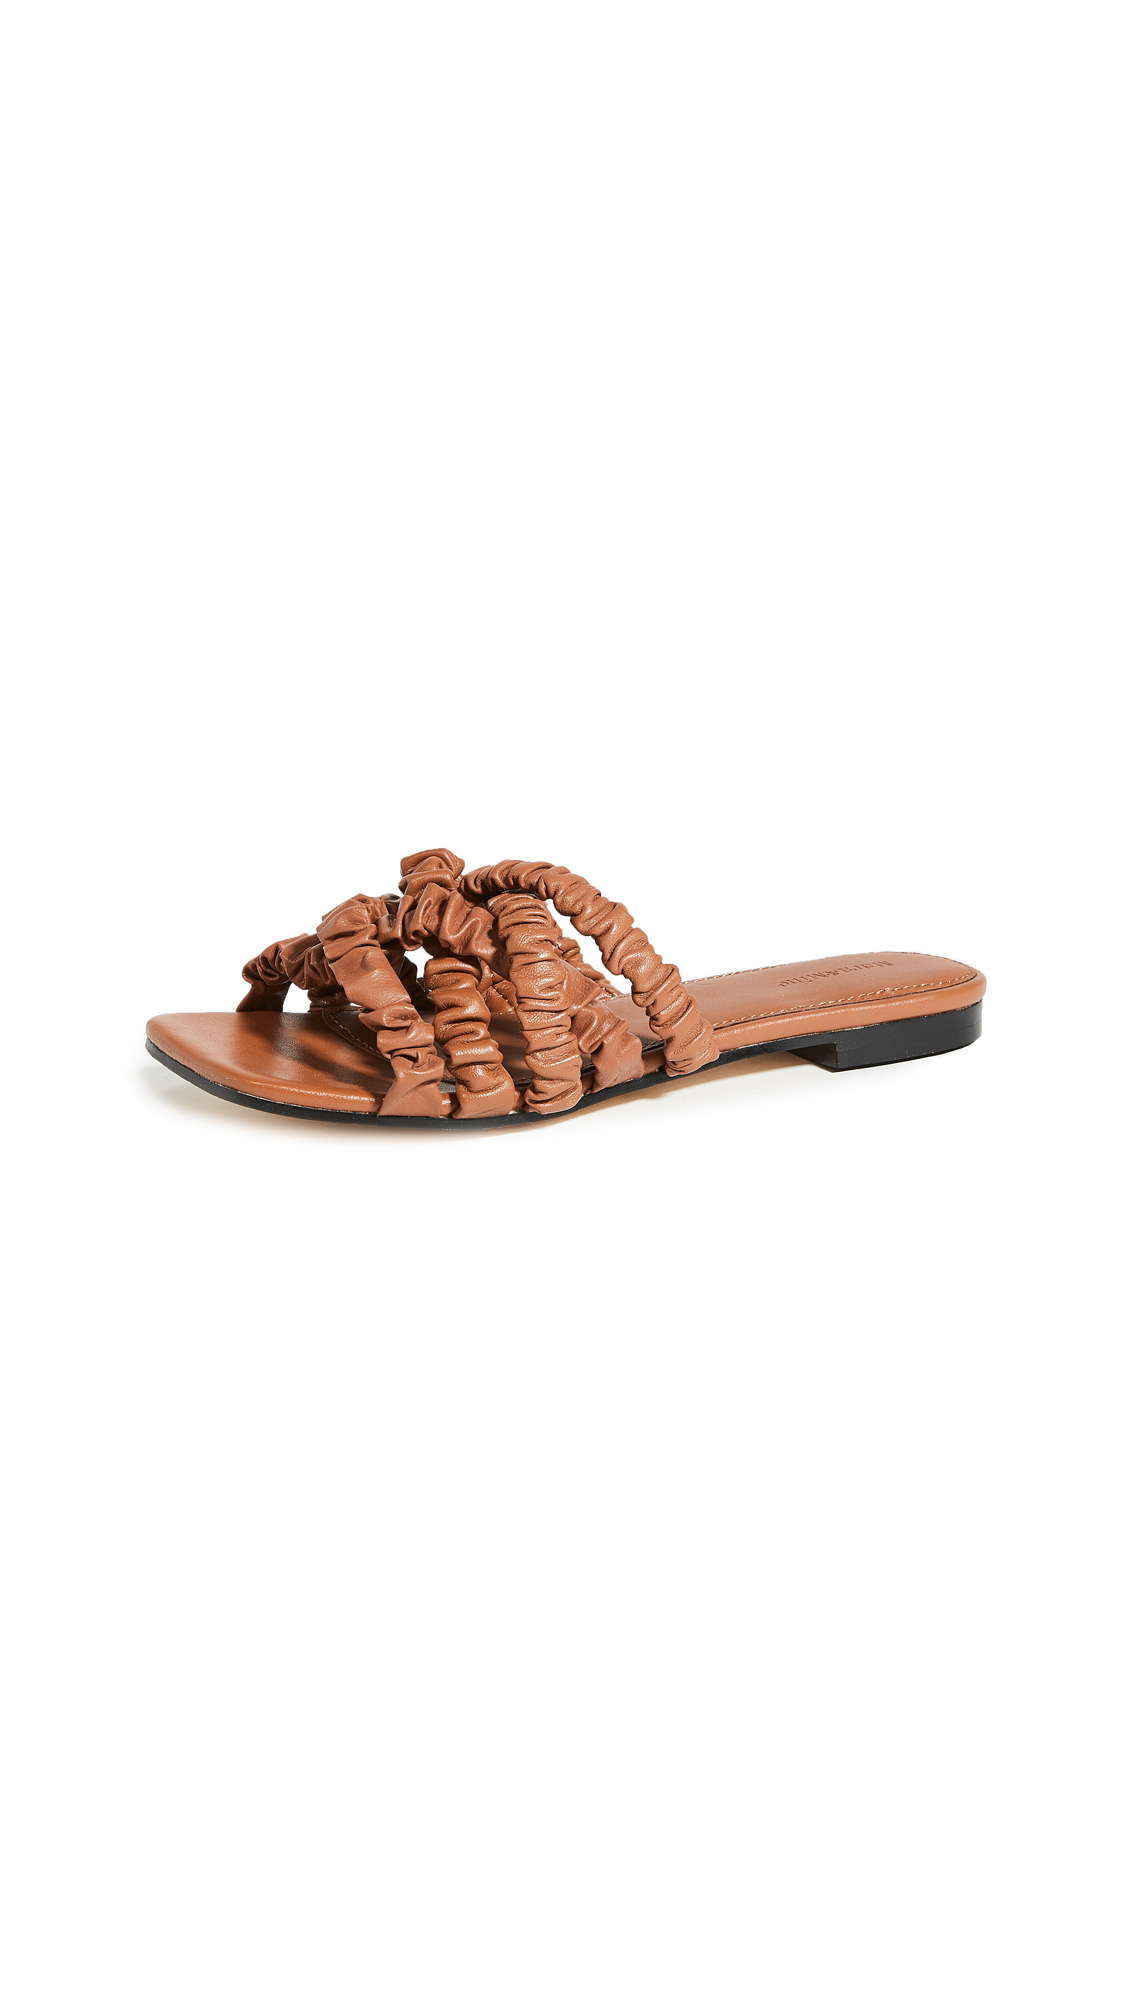 Buy Mara & Mine Theresa Scrunchie Sandals online, shop Mara & Mine